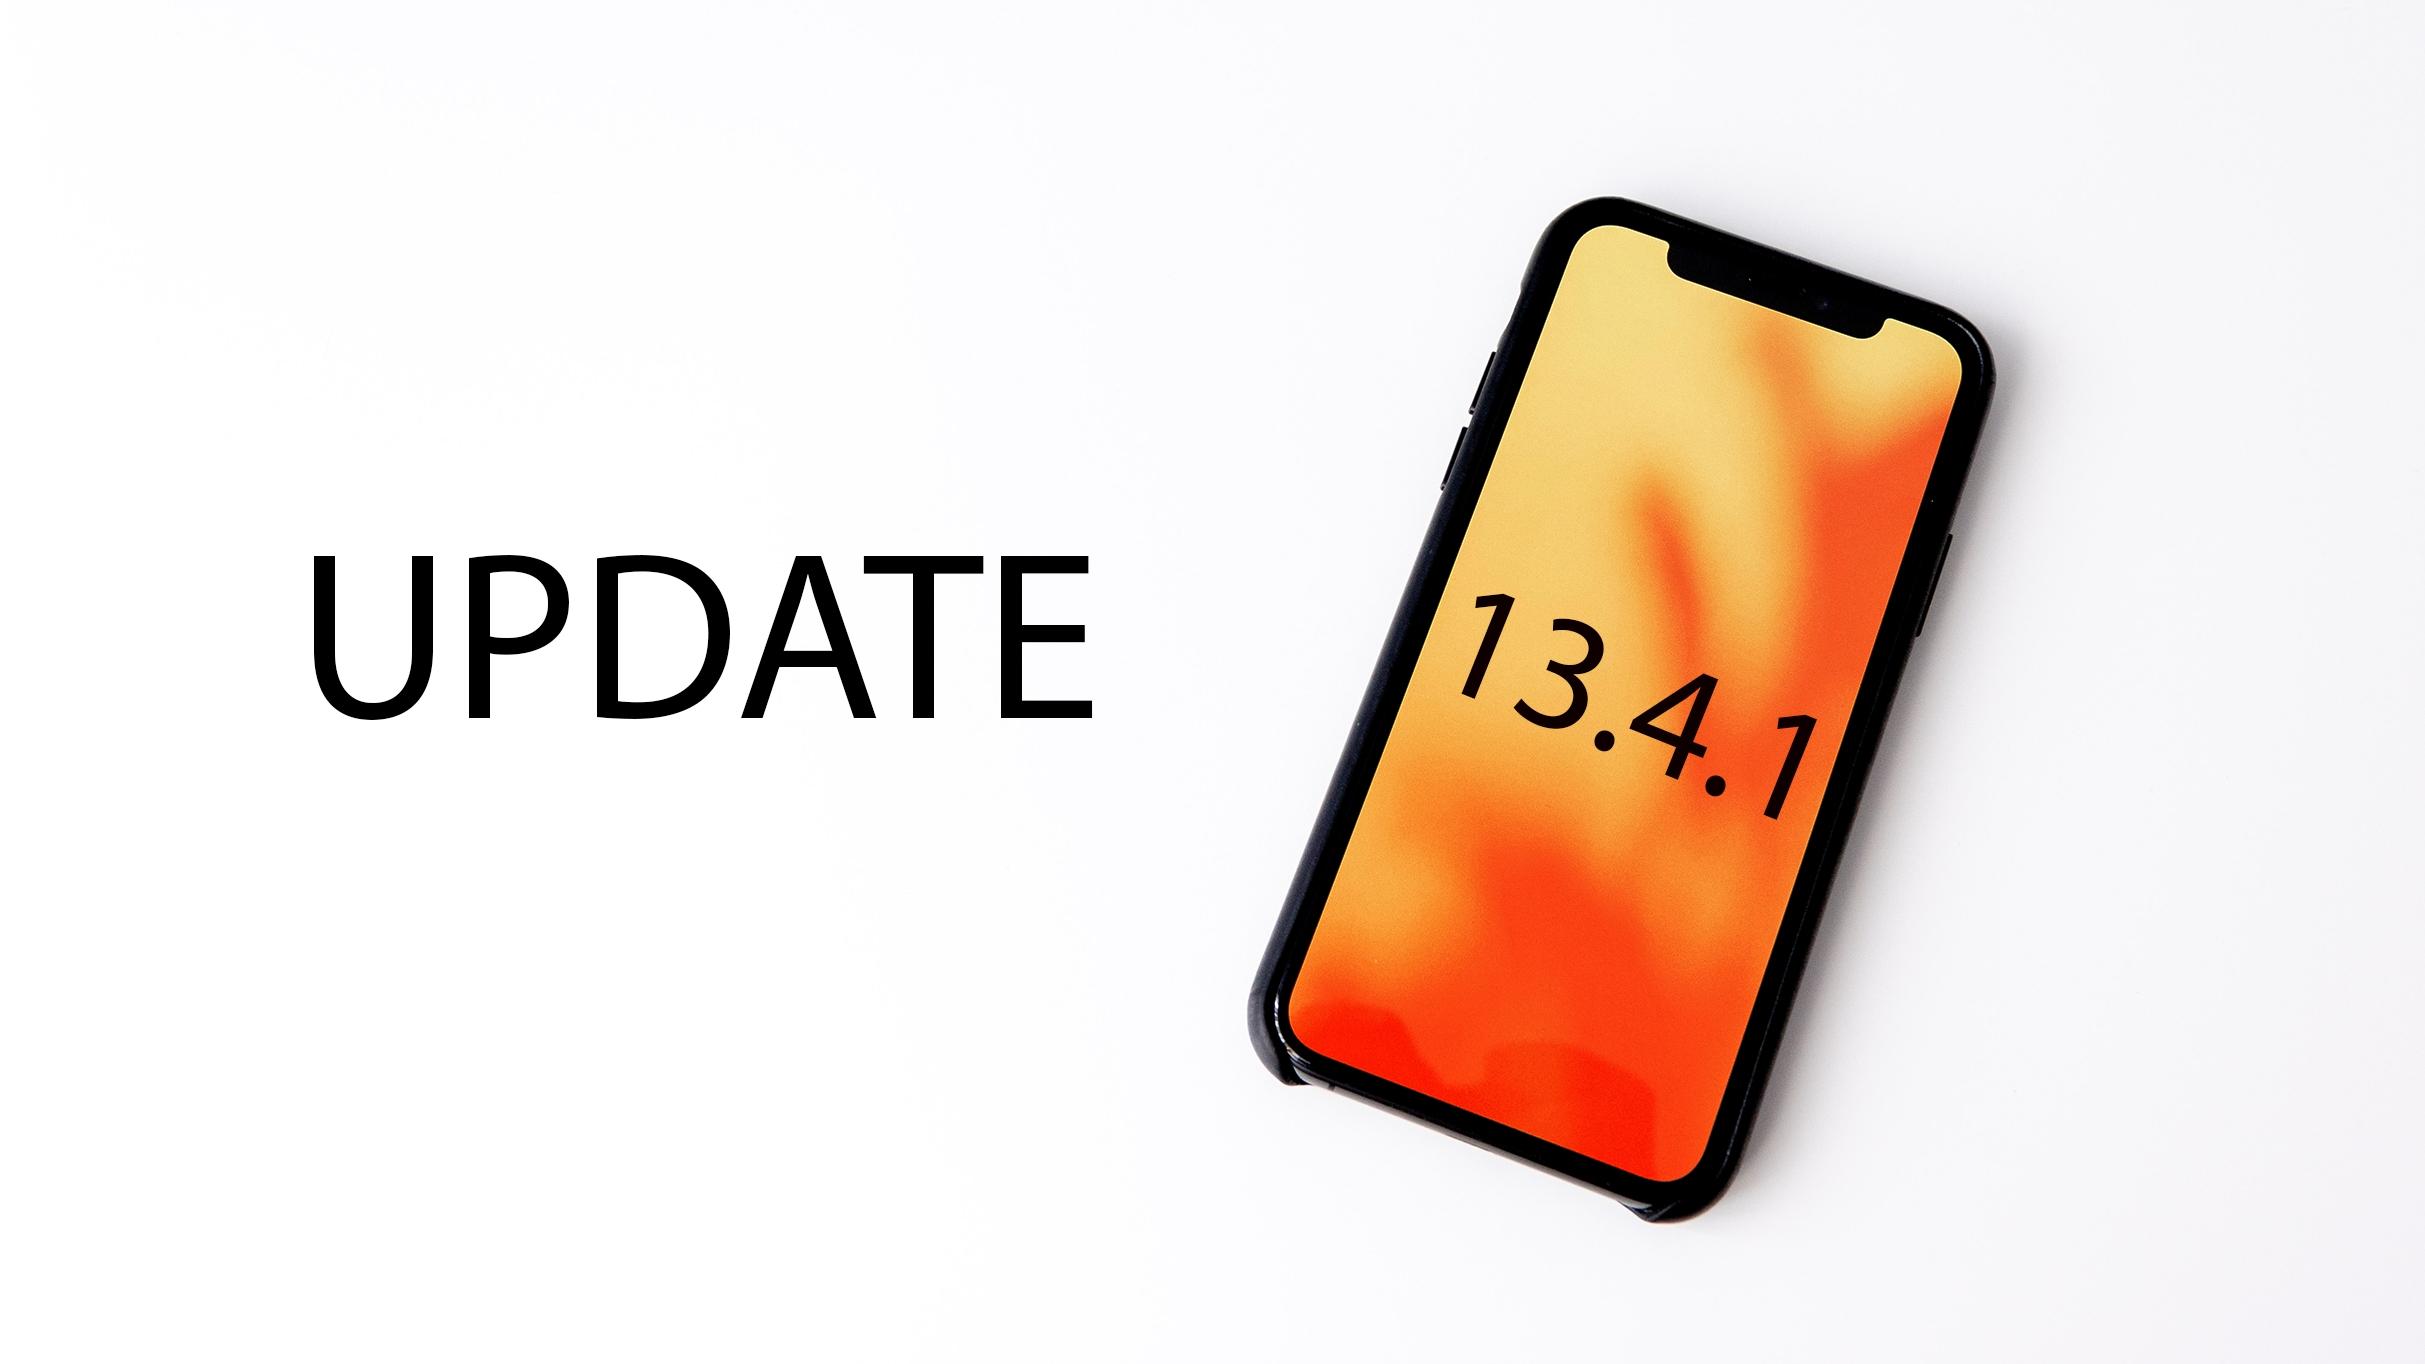 iOS 13.4.1 přináší opravu FaceTime a Bluetooth